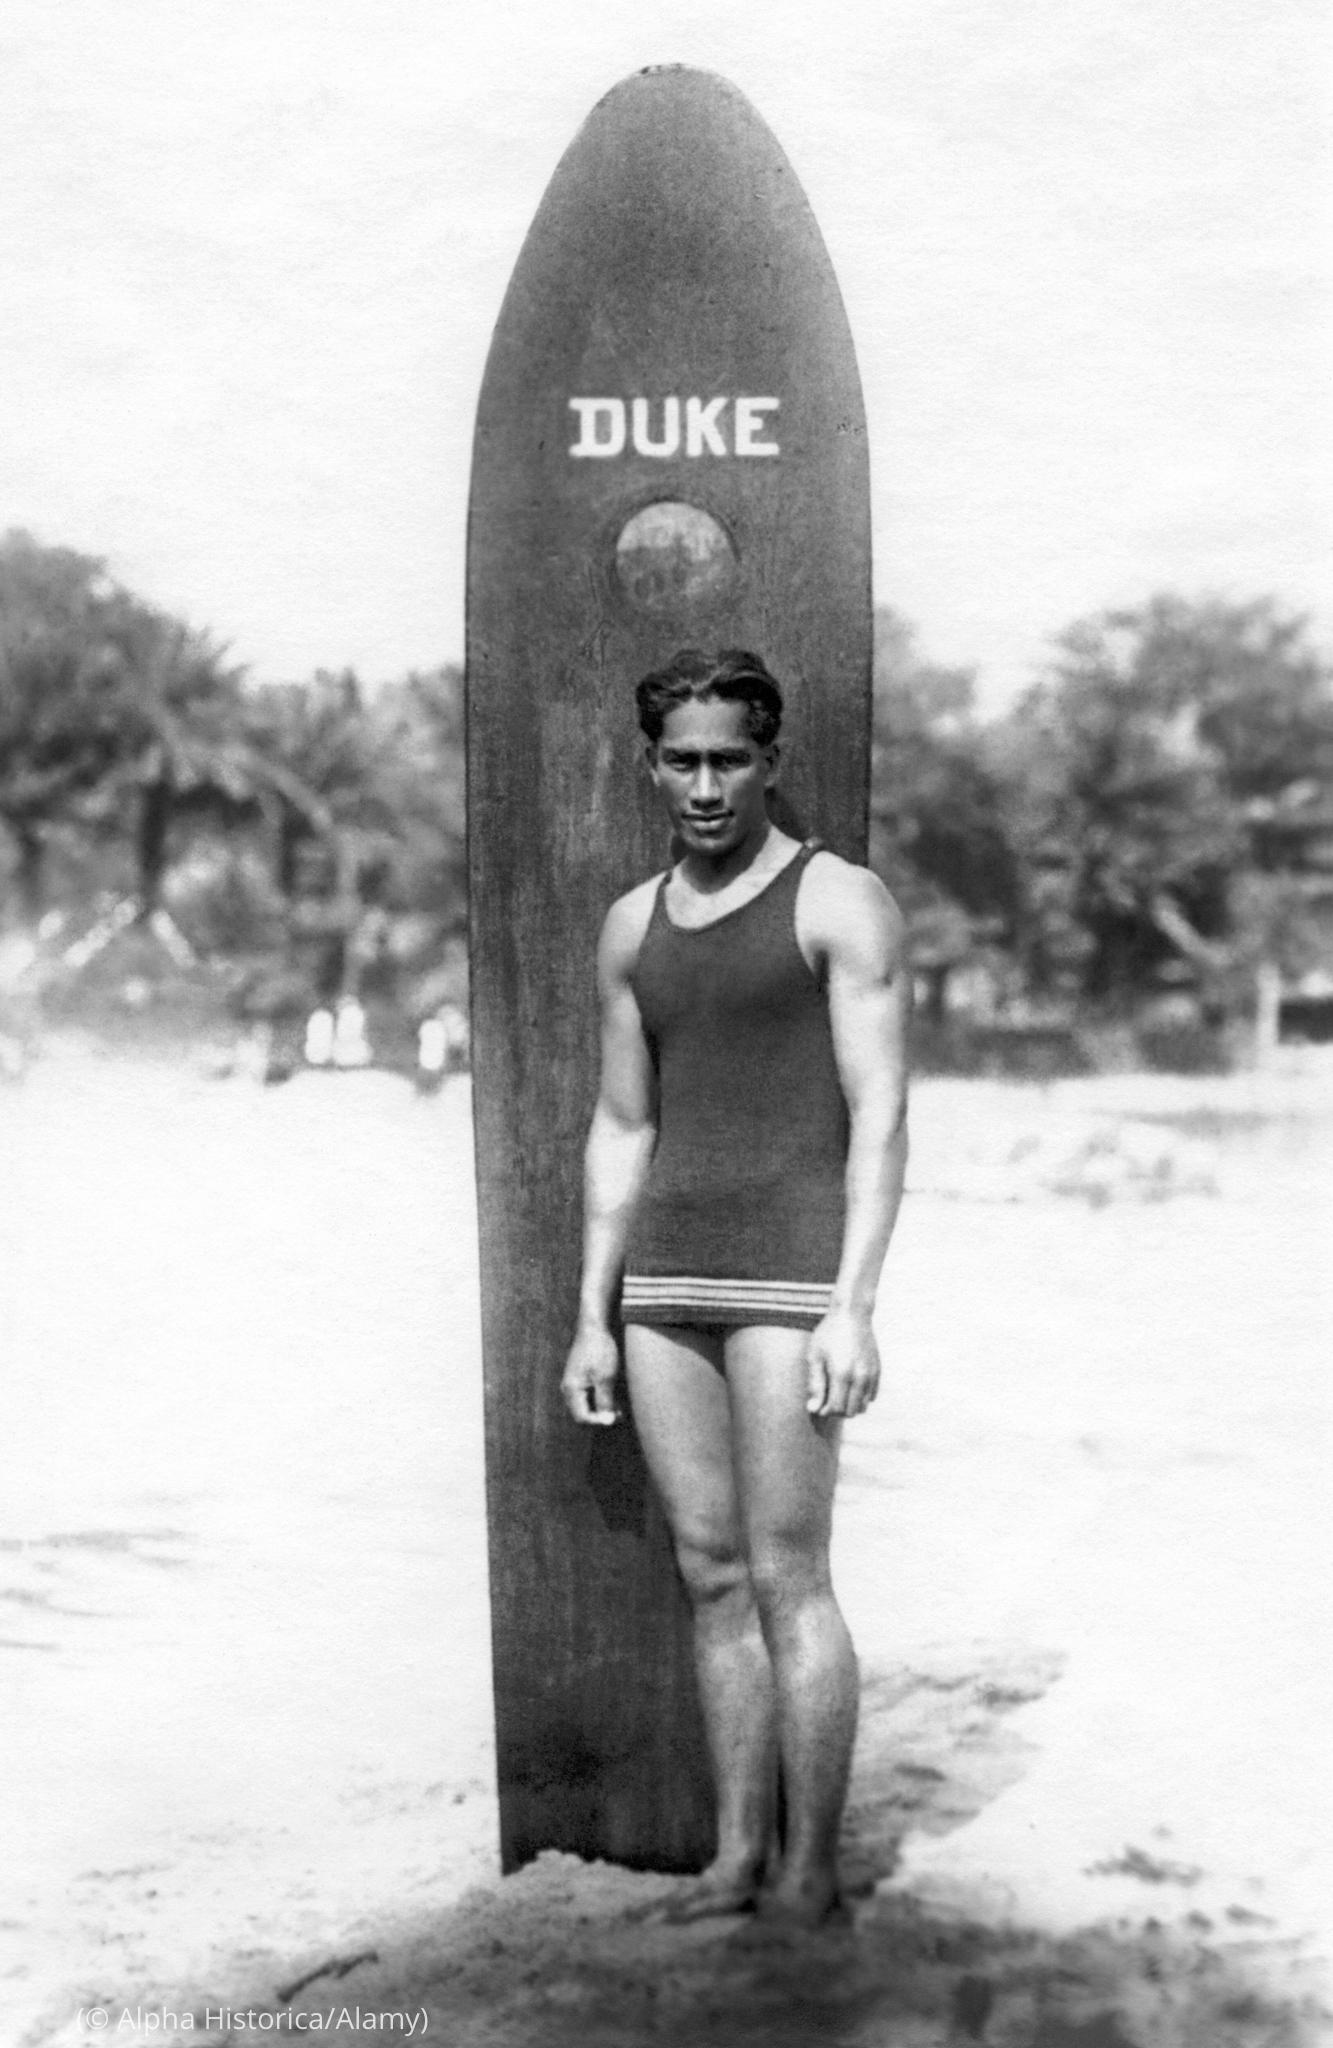 Duke Kahanamoku en traje de baño frente a una tabla de surf en la playa (© Alpha Histórica/Alamy)